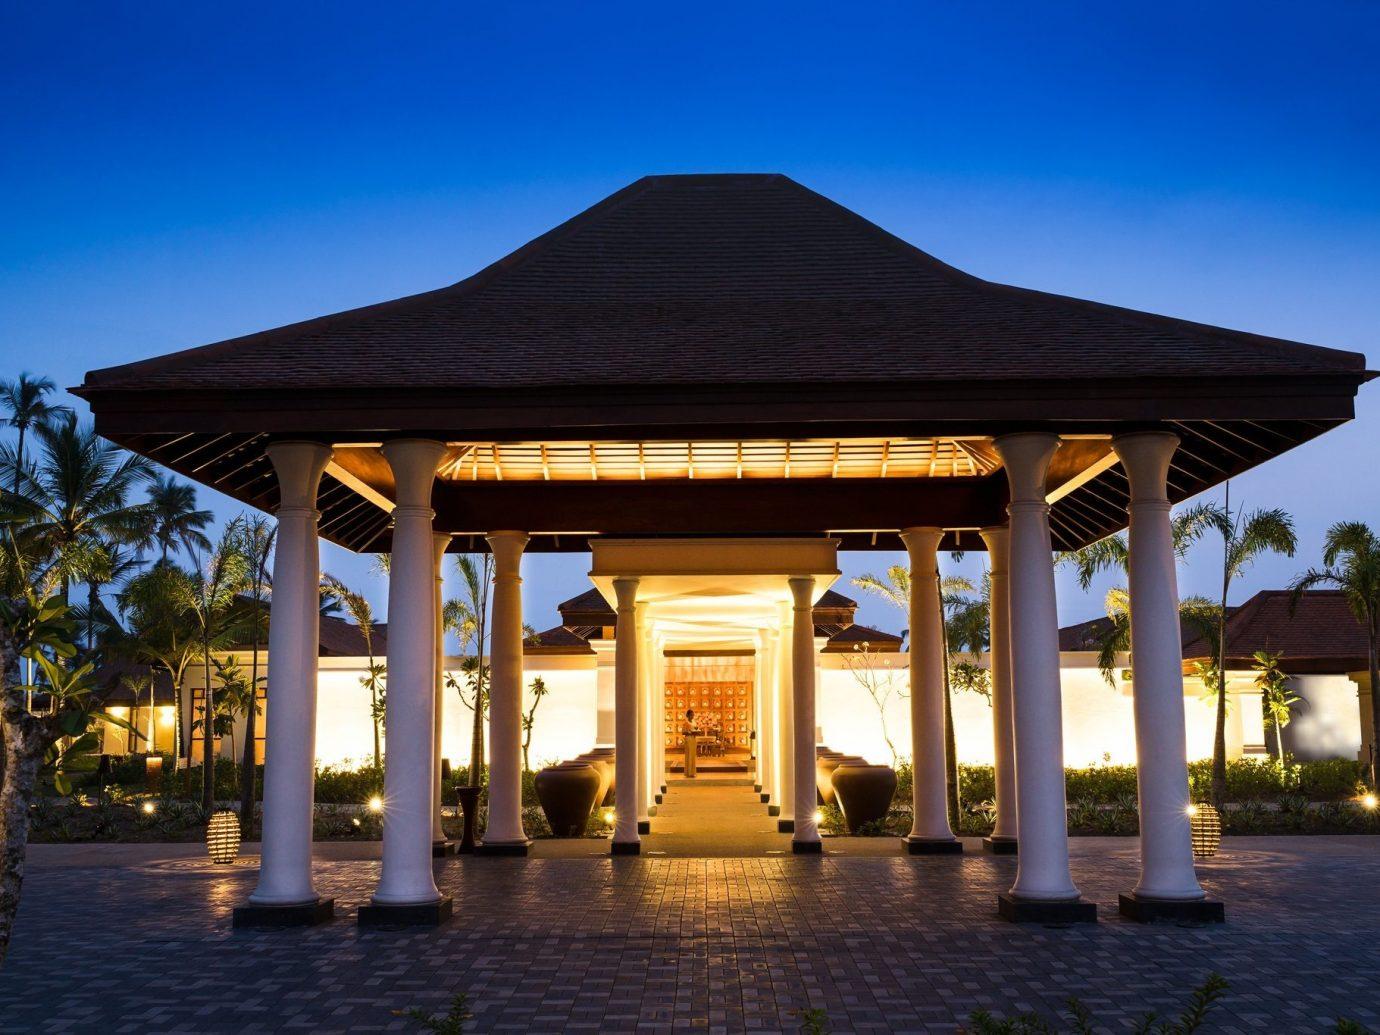 Trip Ideas outdoor sky building gazebo vacation Resort house estate pavilion outdoor structure shinto shrine